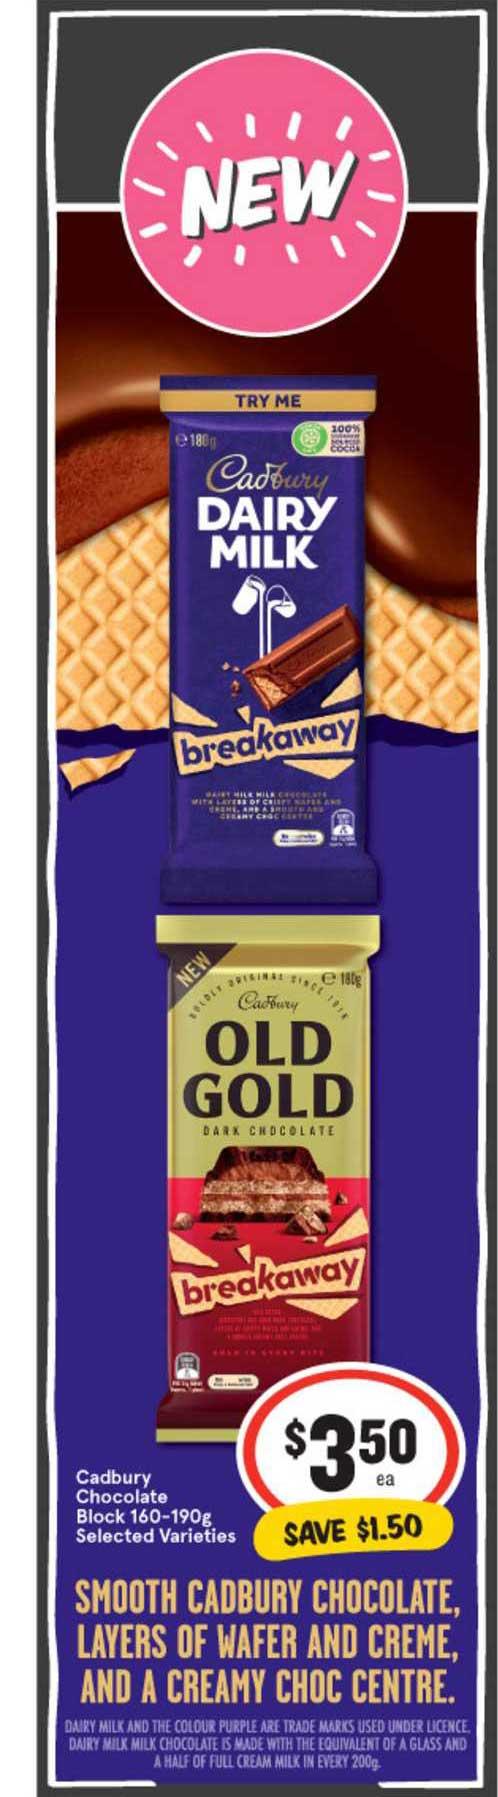 IGA Cadbury Chocolate Block 160-190g